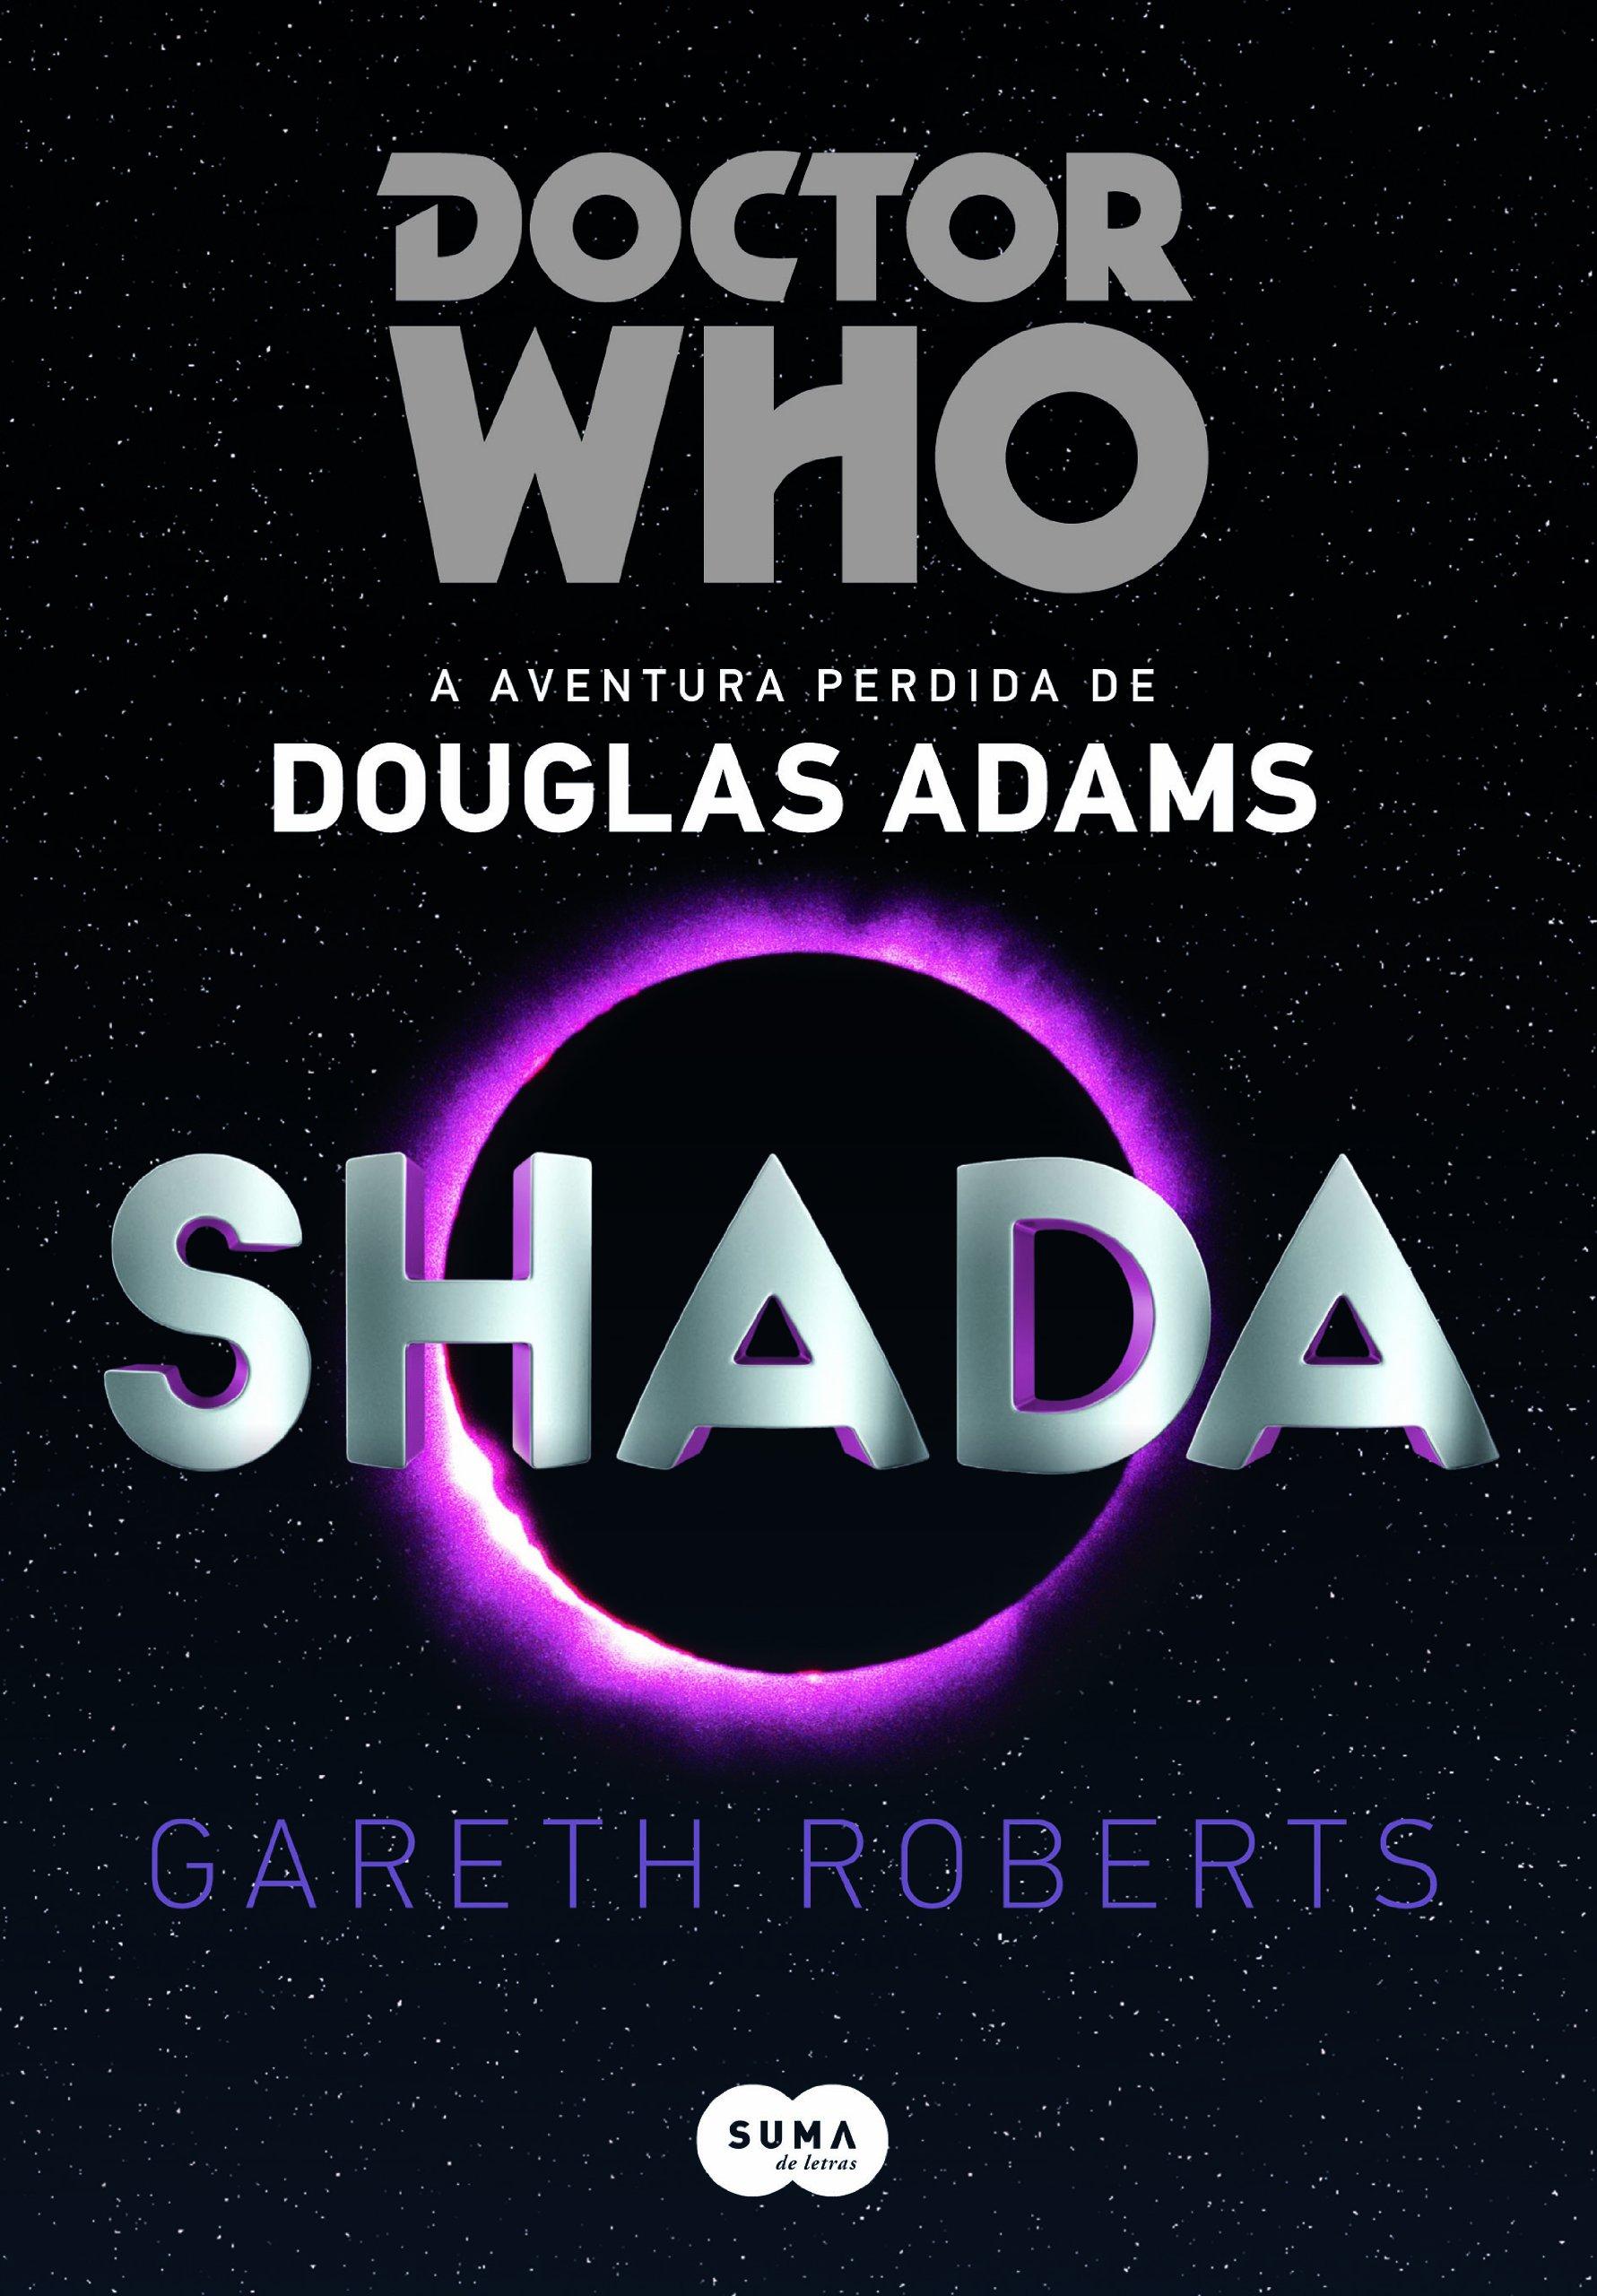 Resenha | Doctor Who: Shada – Gareth Roberts